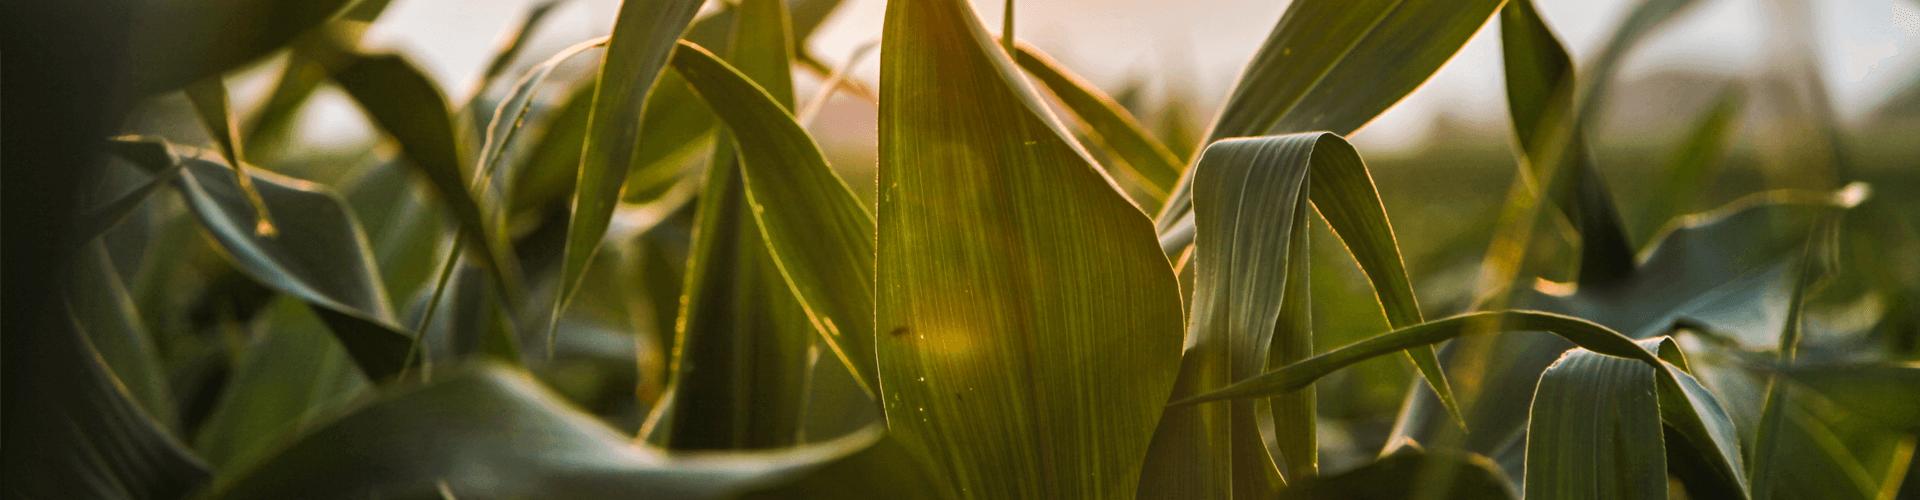 landbouwzaden